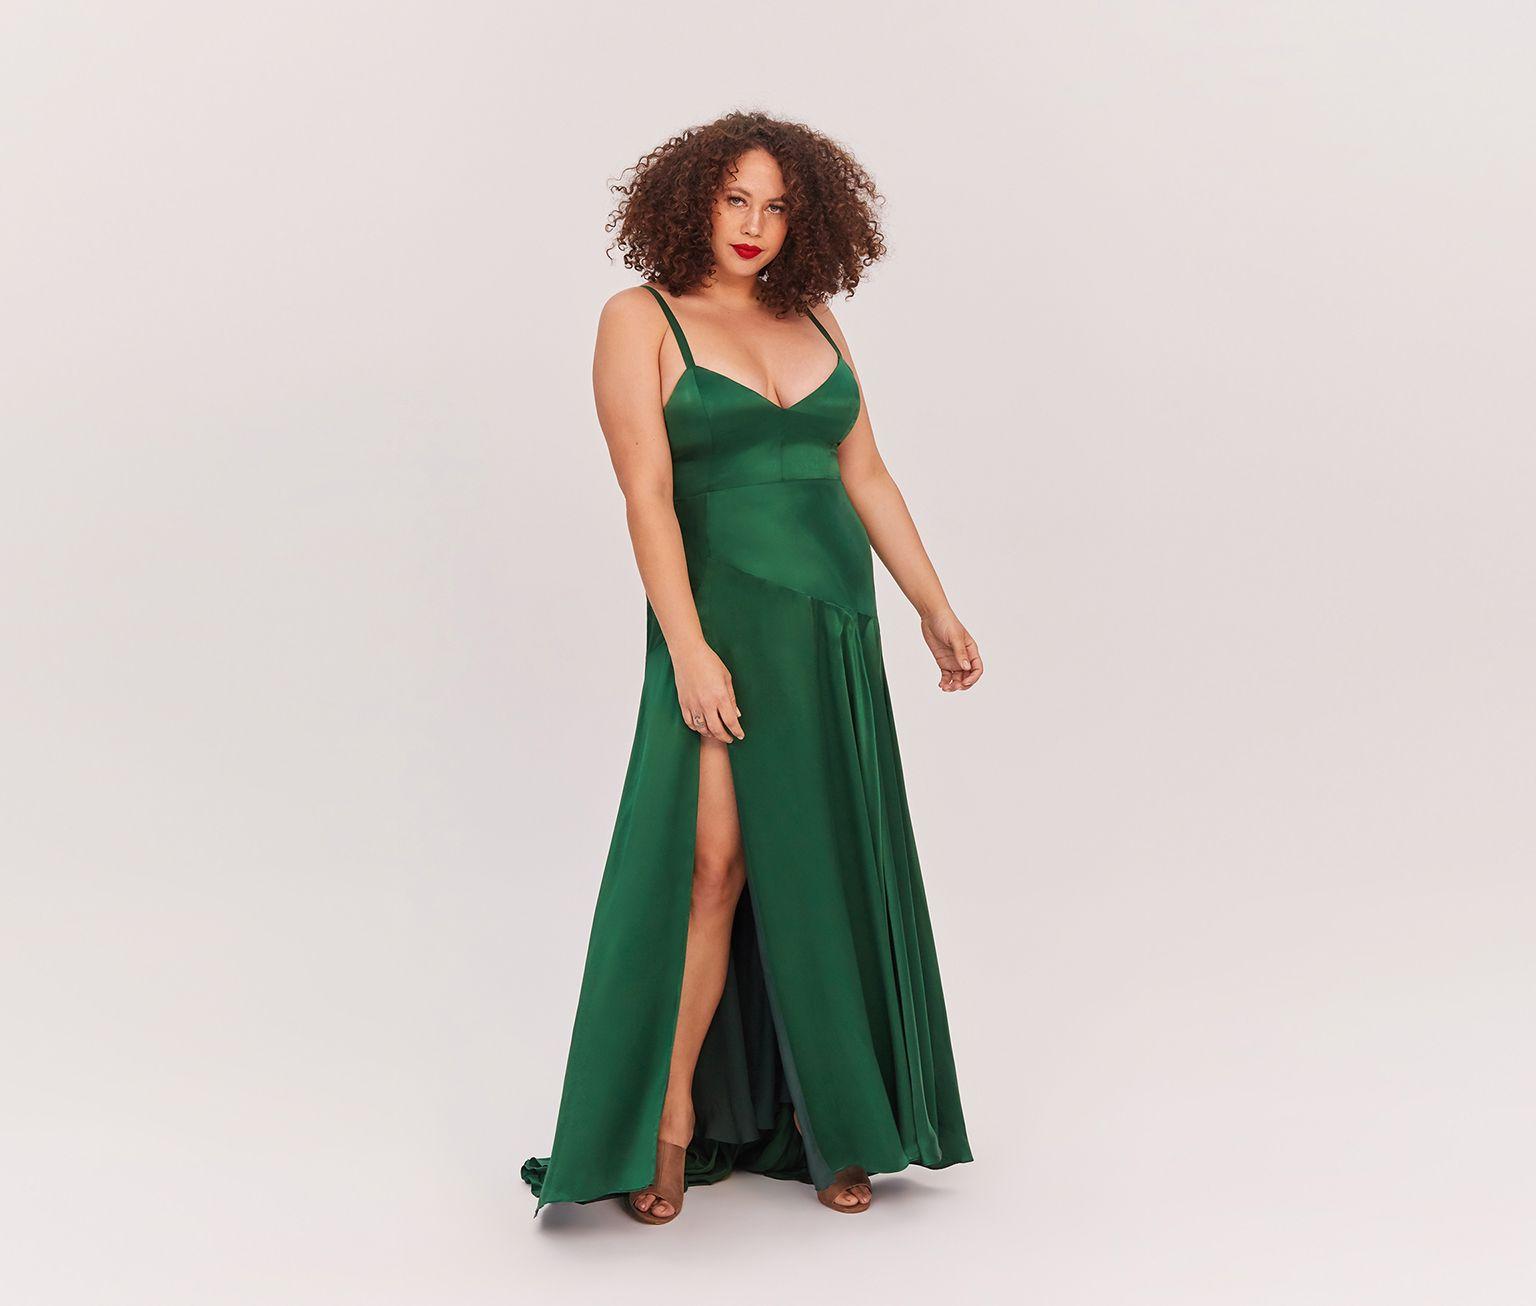 Dress 13 dresses elegant maxi dress green gown